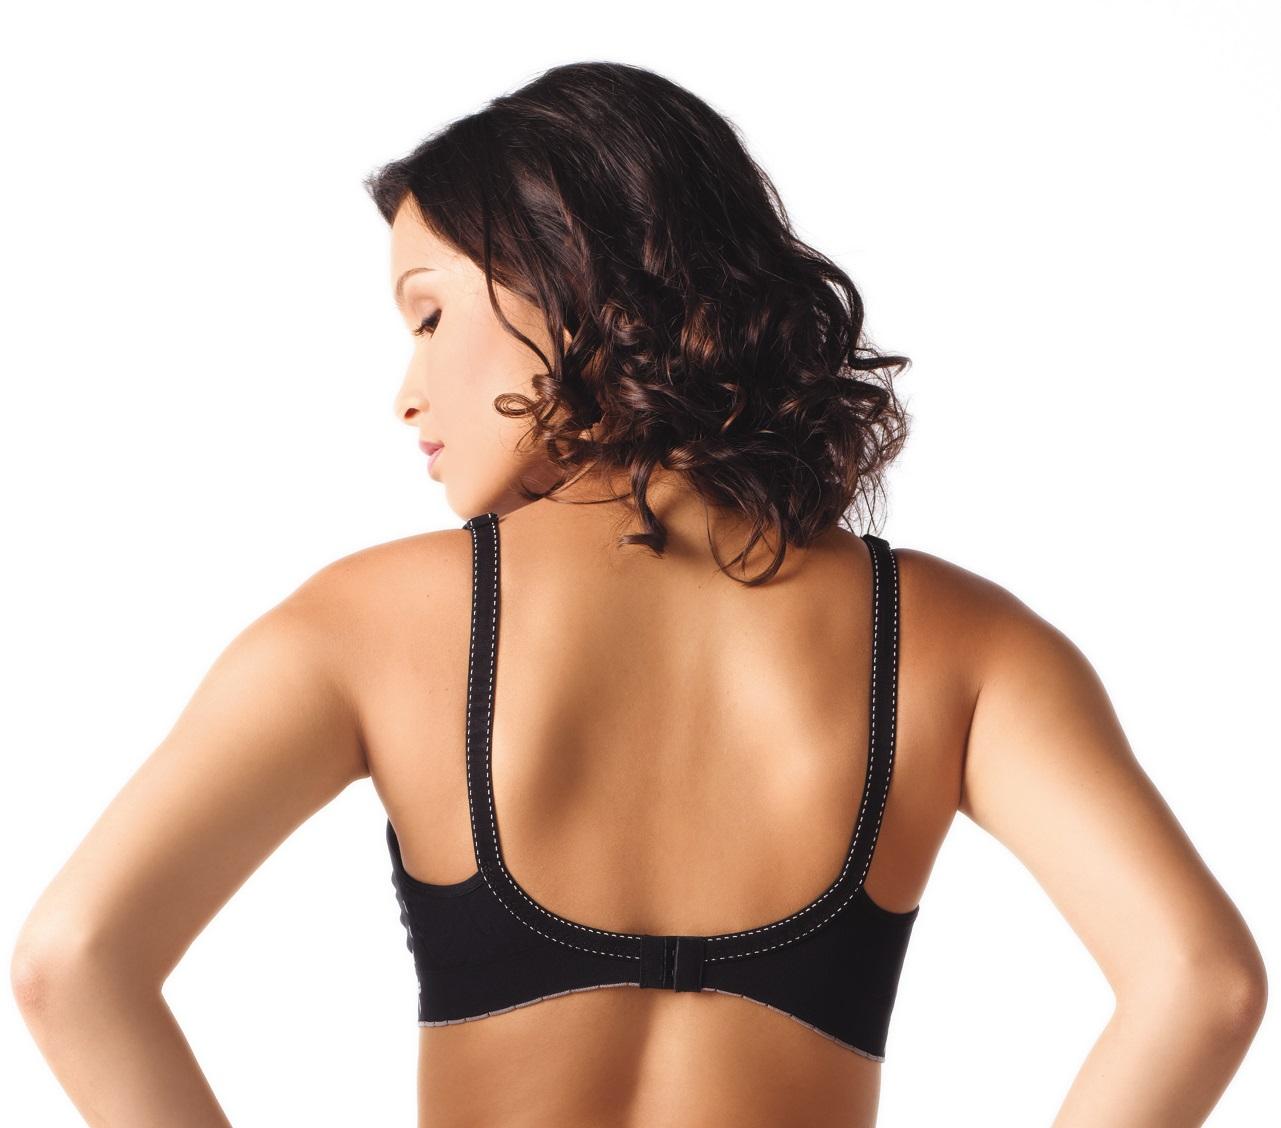 cache-coeur-illusion-nursing-bra-black-2.jpg